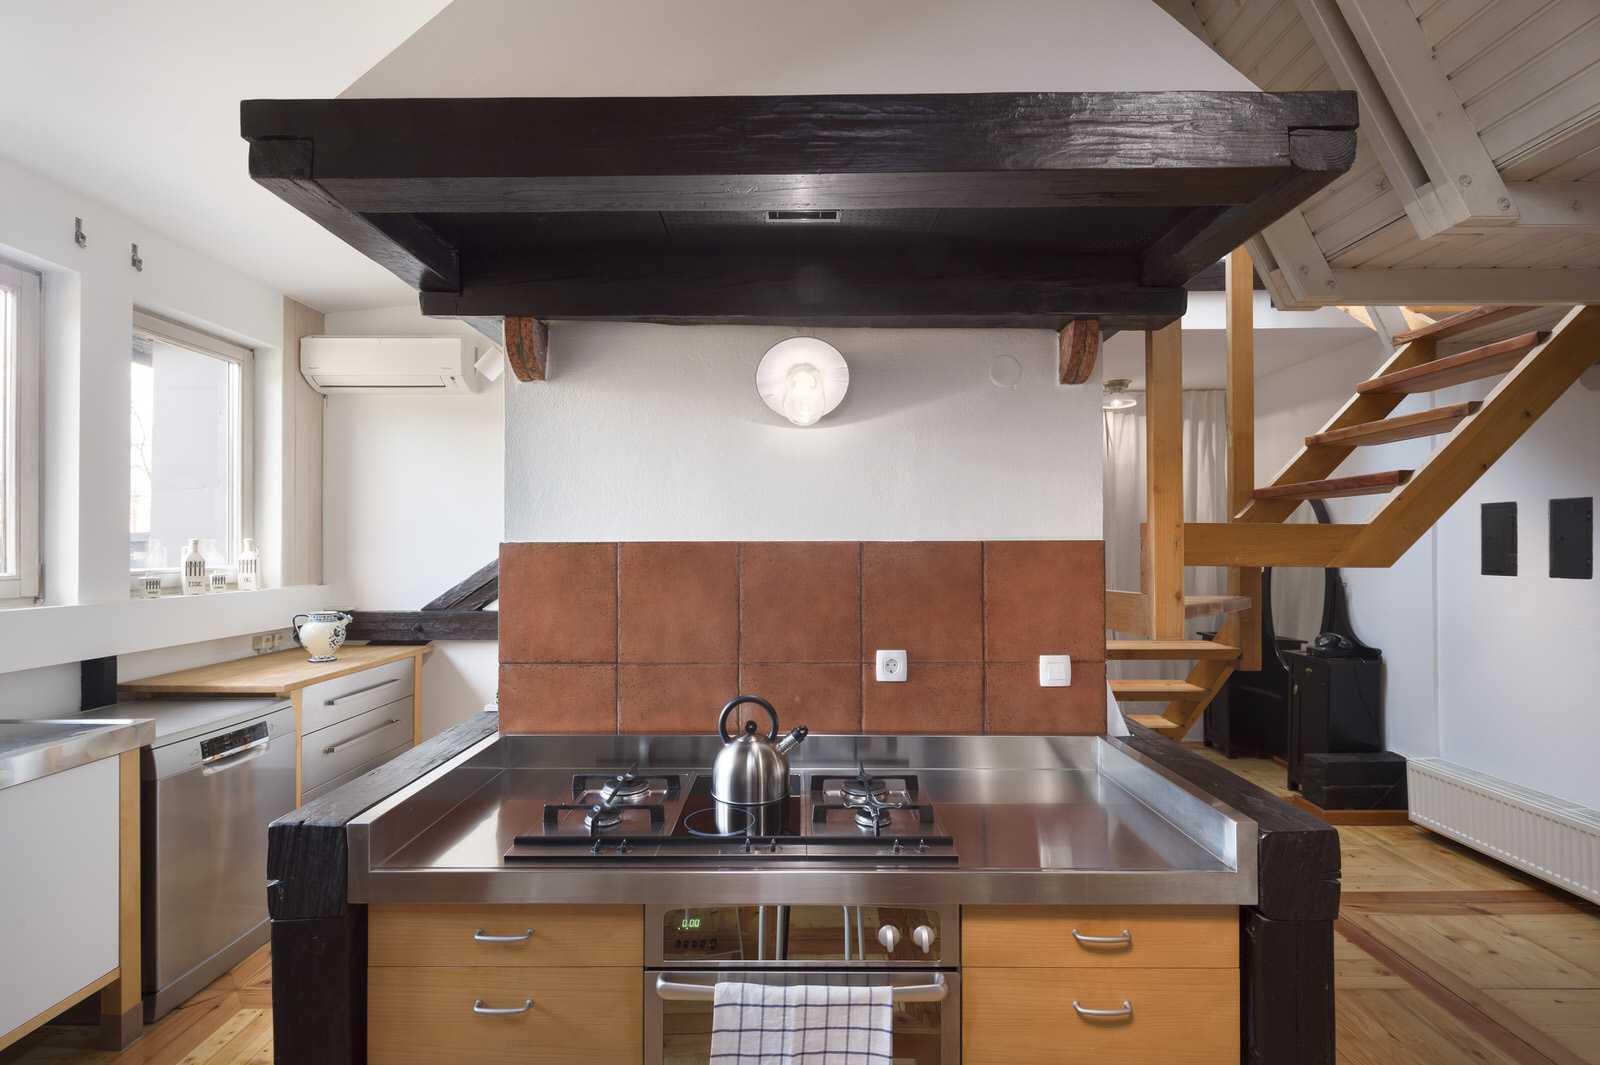 The cooker has six burners.